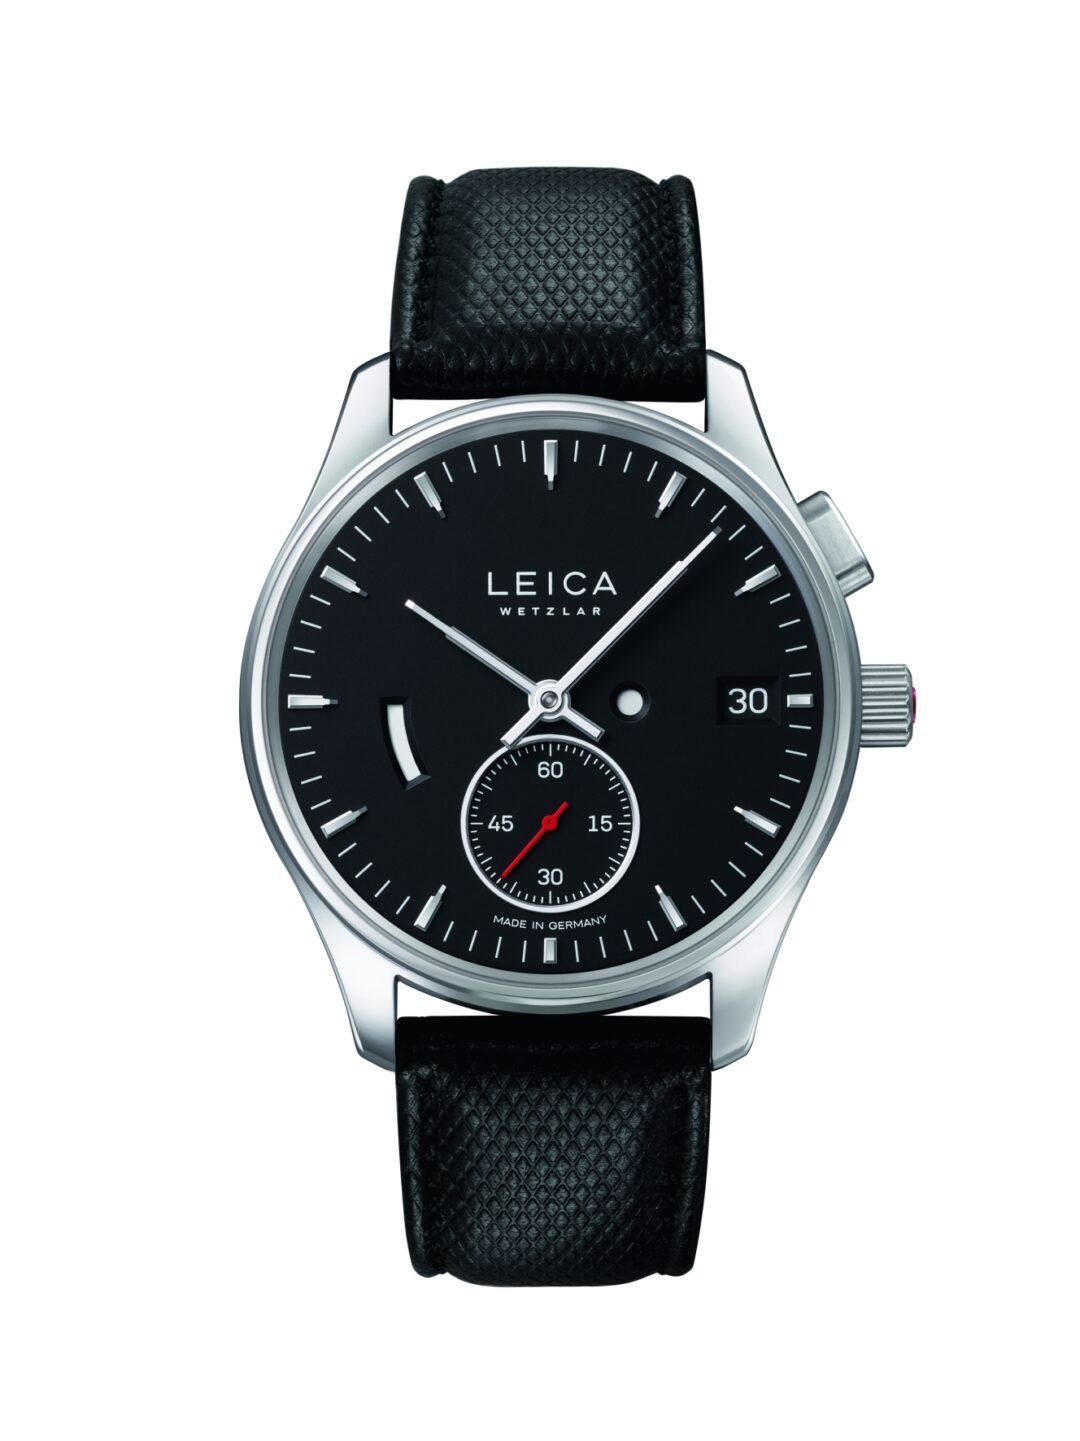 Leica L1 black